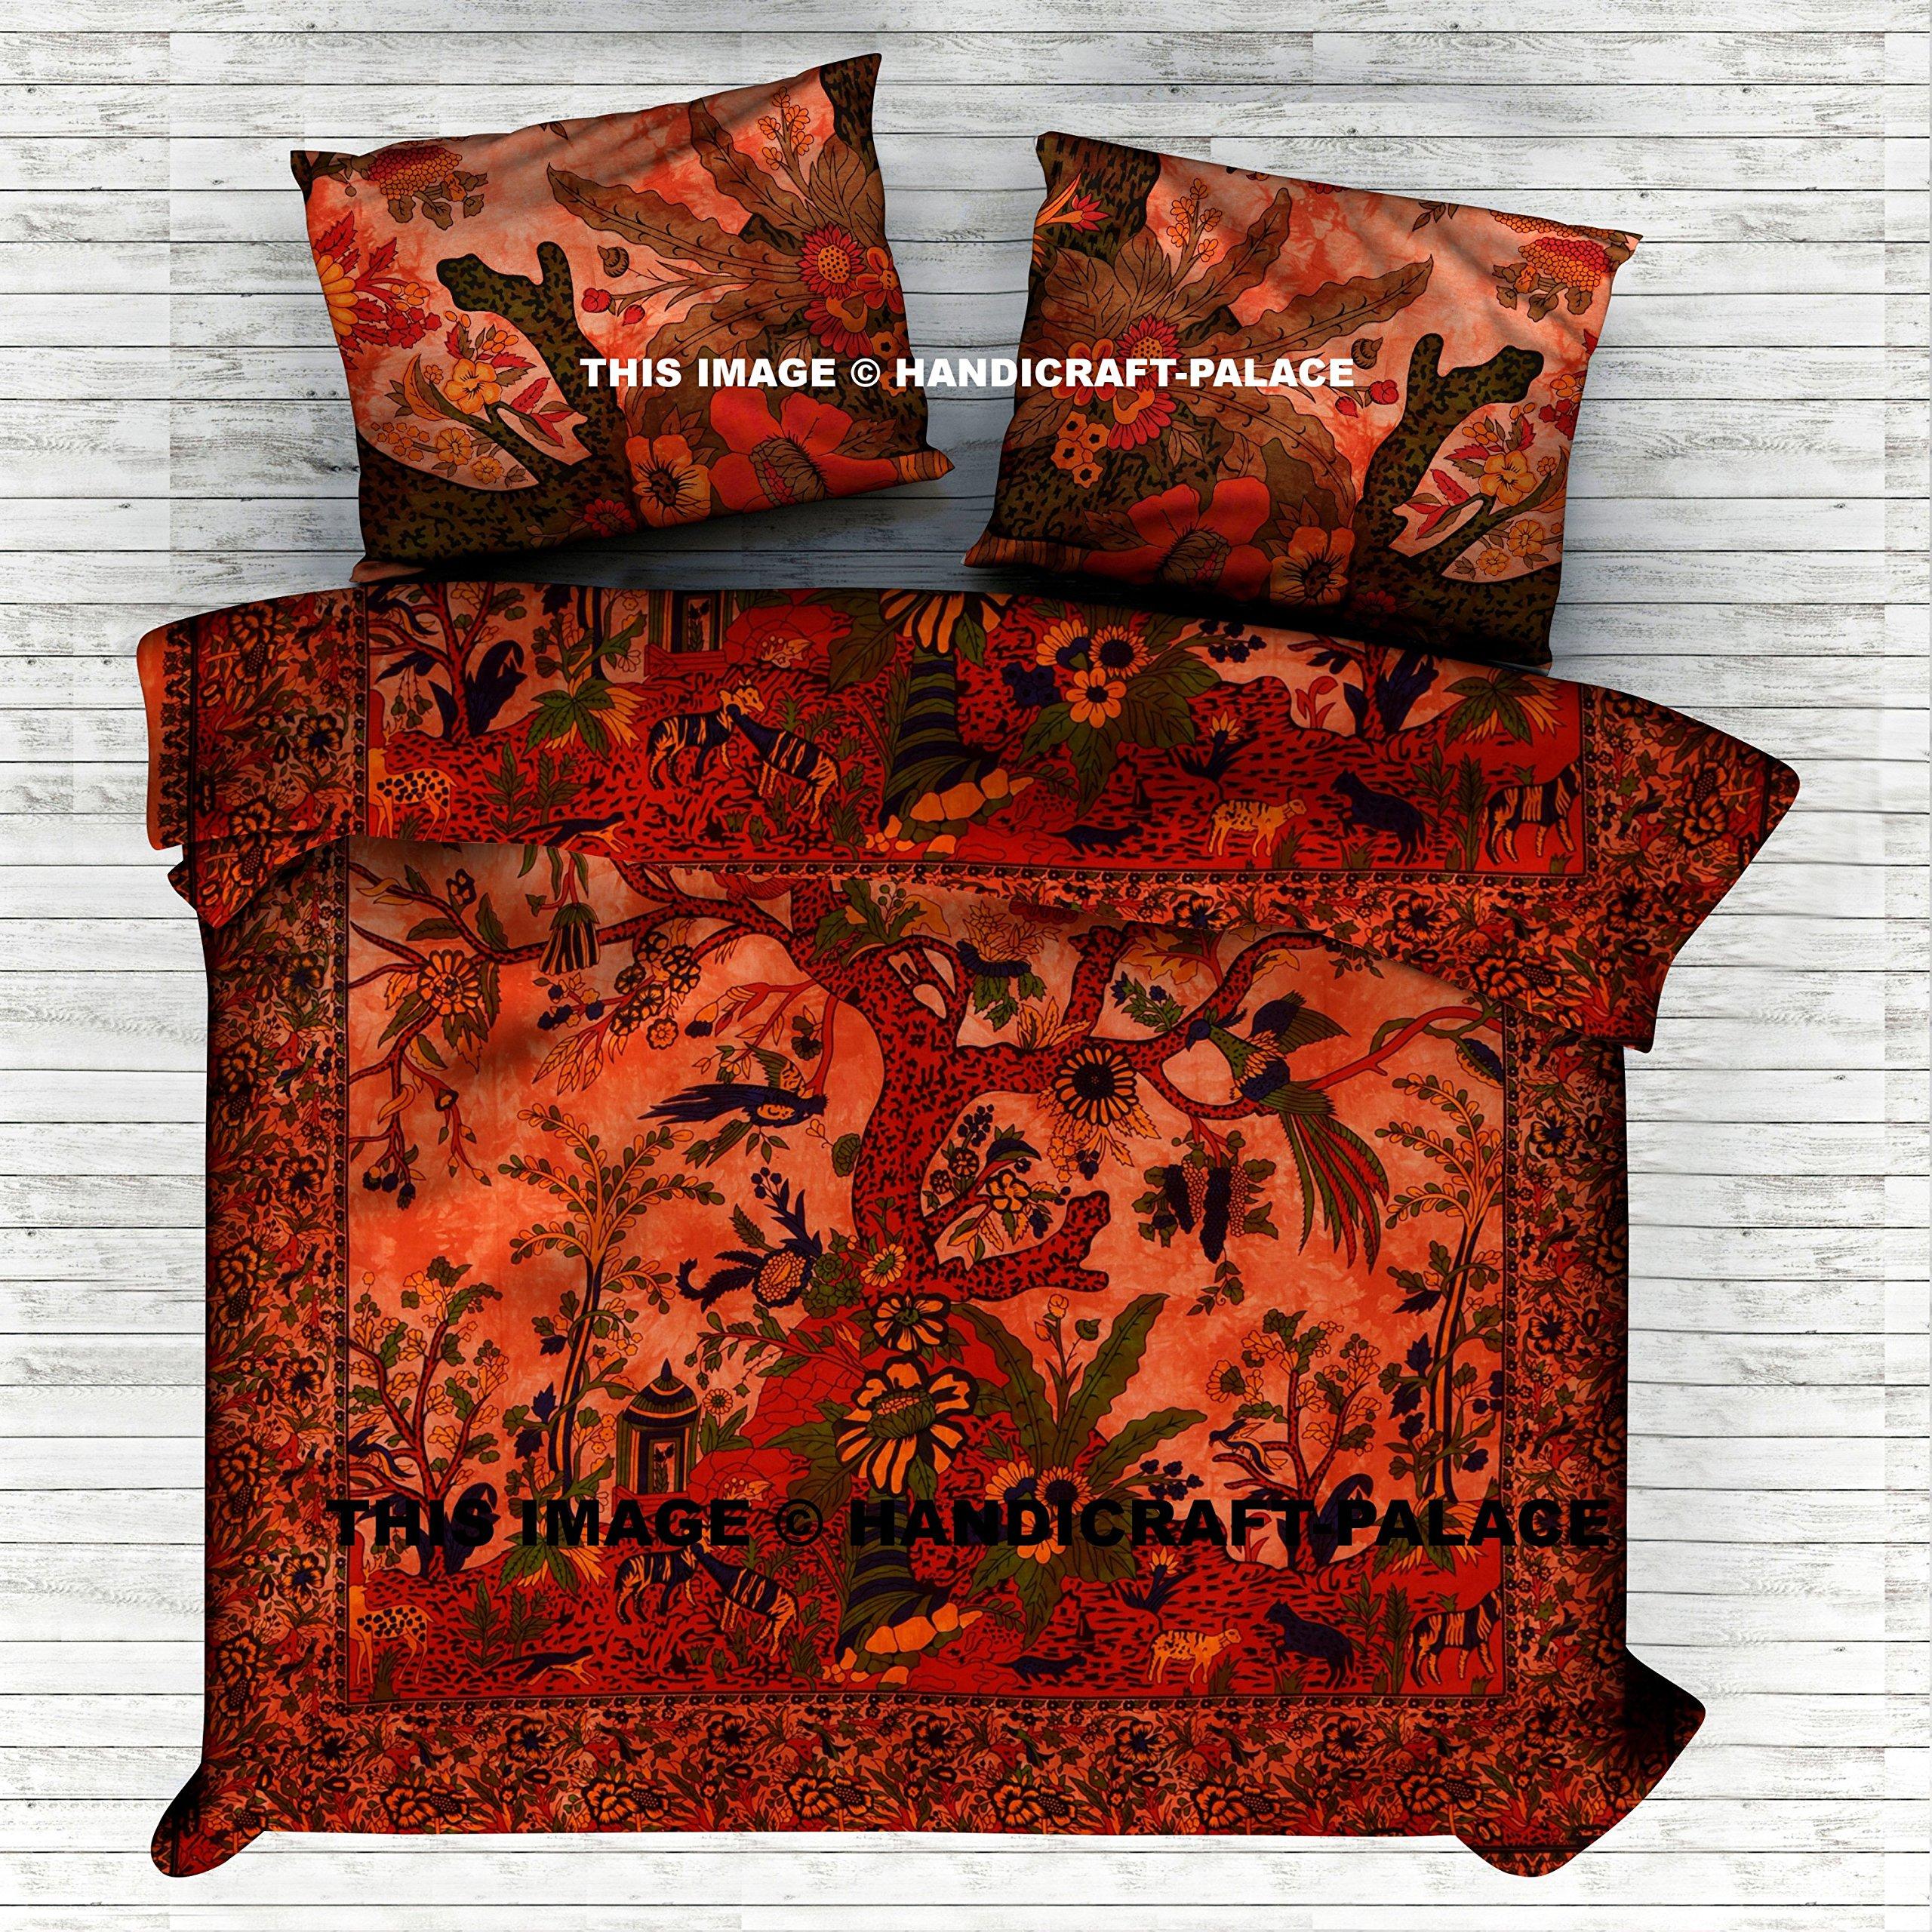 Indian Tree Of Life Duvet Doona Cover Bedding Blanket Queen Quilt Cover Comforter Set By ''Handicraft-Palace'' Indian Mandala Bedding Set